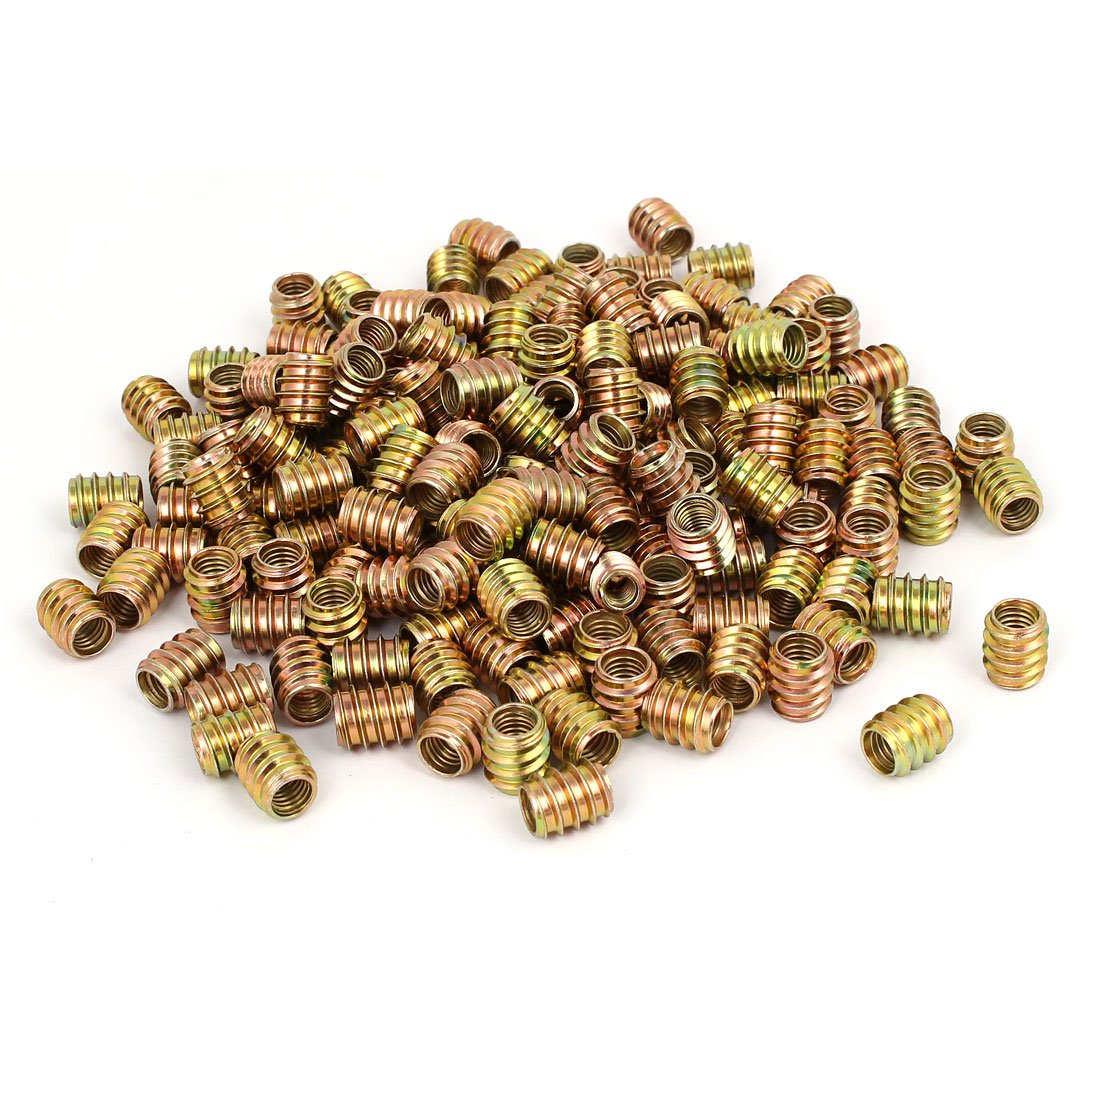 uxcell M8 x 15mm Wood Furniture Insert Screw E-Nut Bronze Tone 250pcs